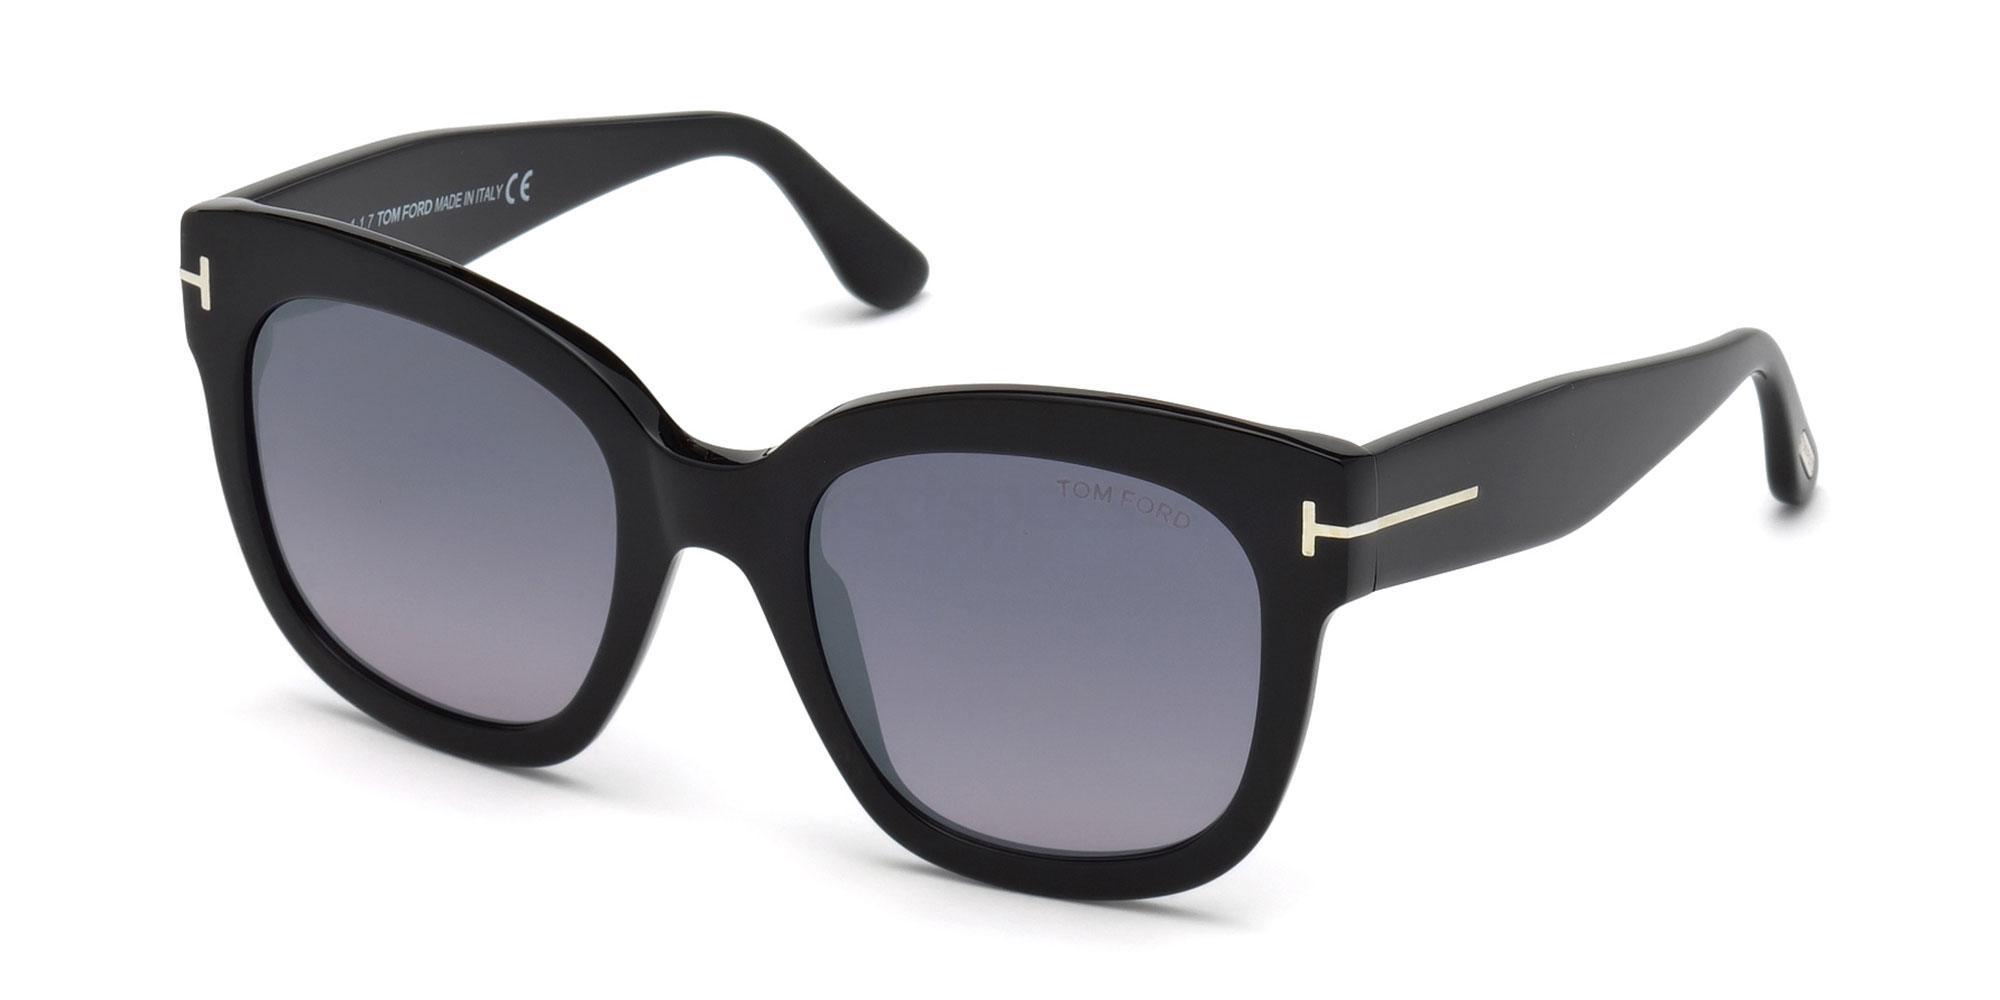 01C FT0613 Sunglasses, Tom Ford